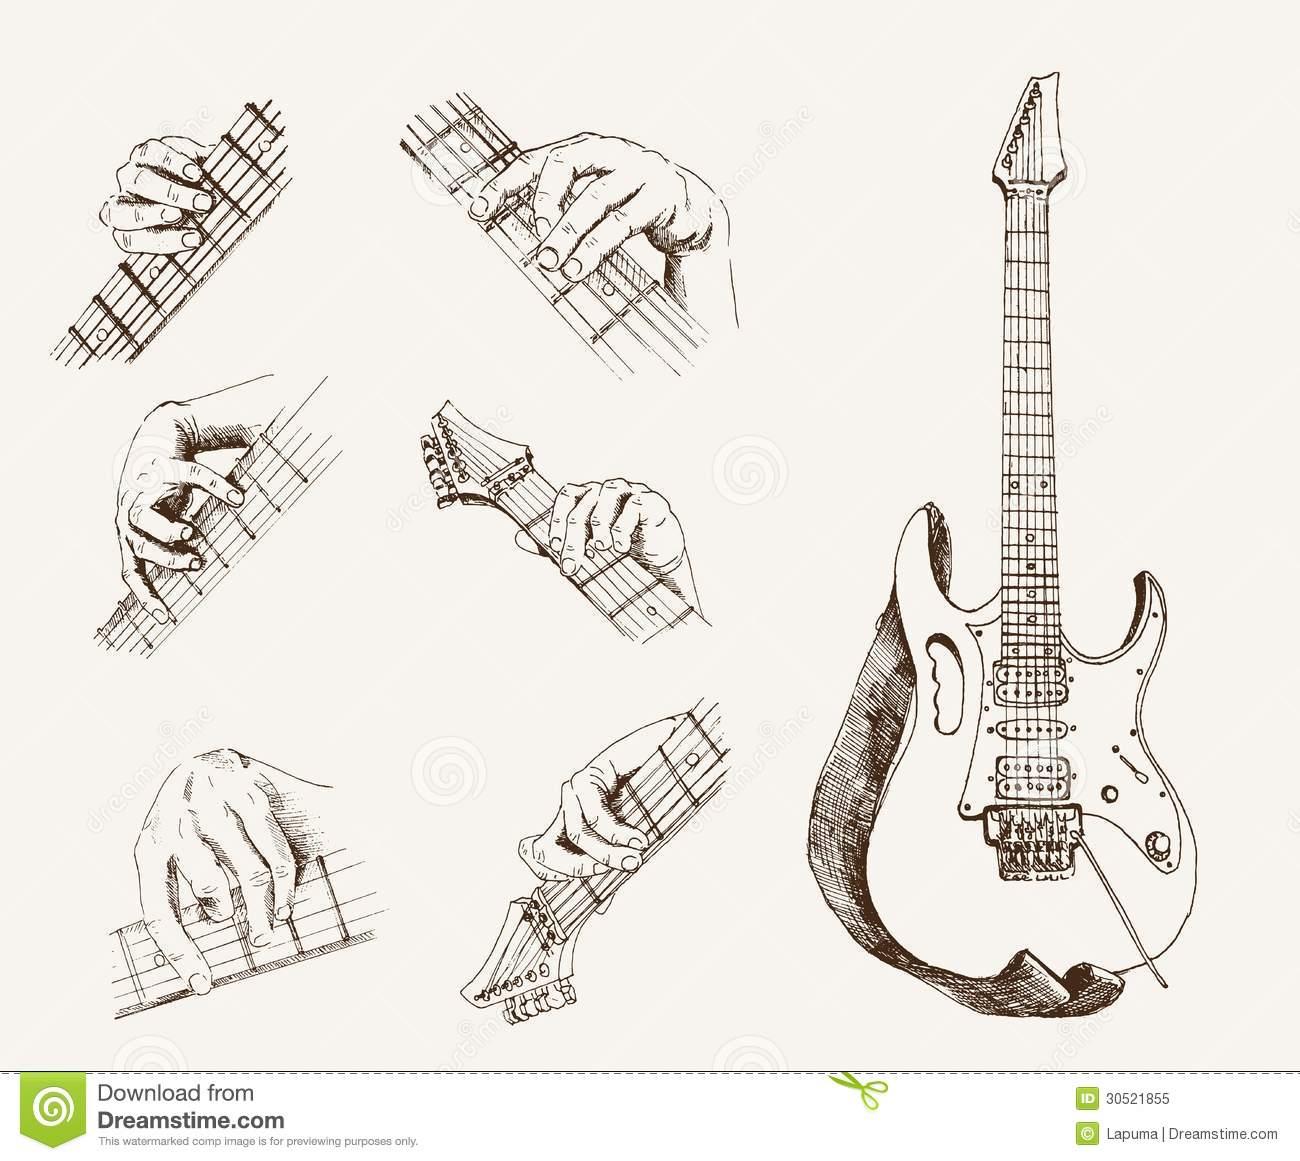 Chords clipart #14